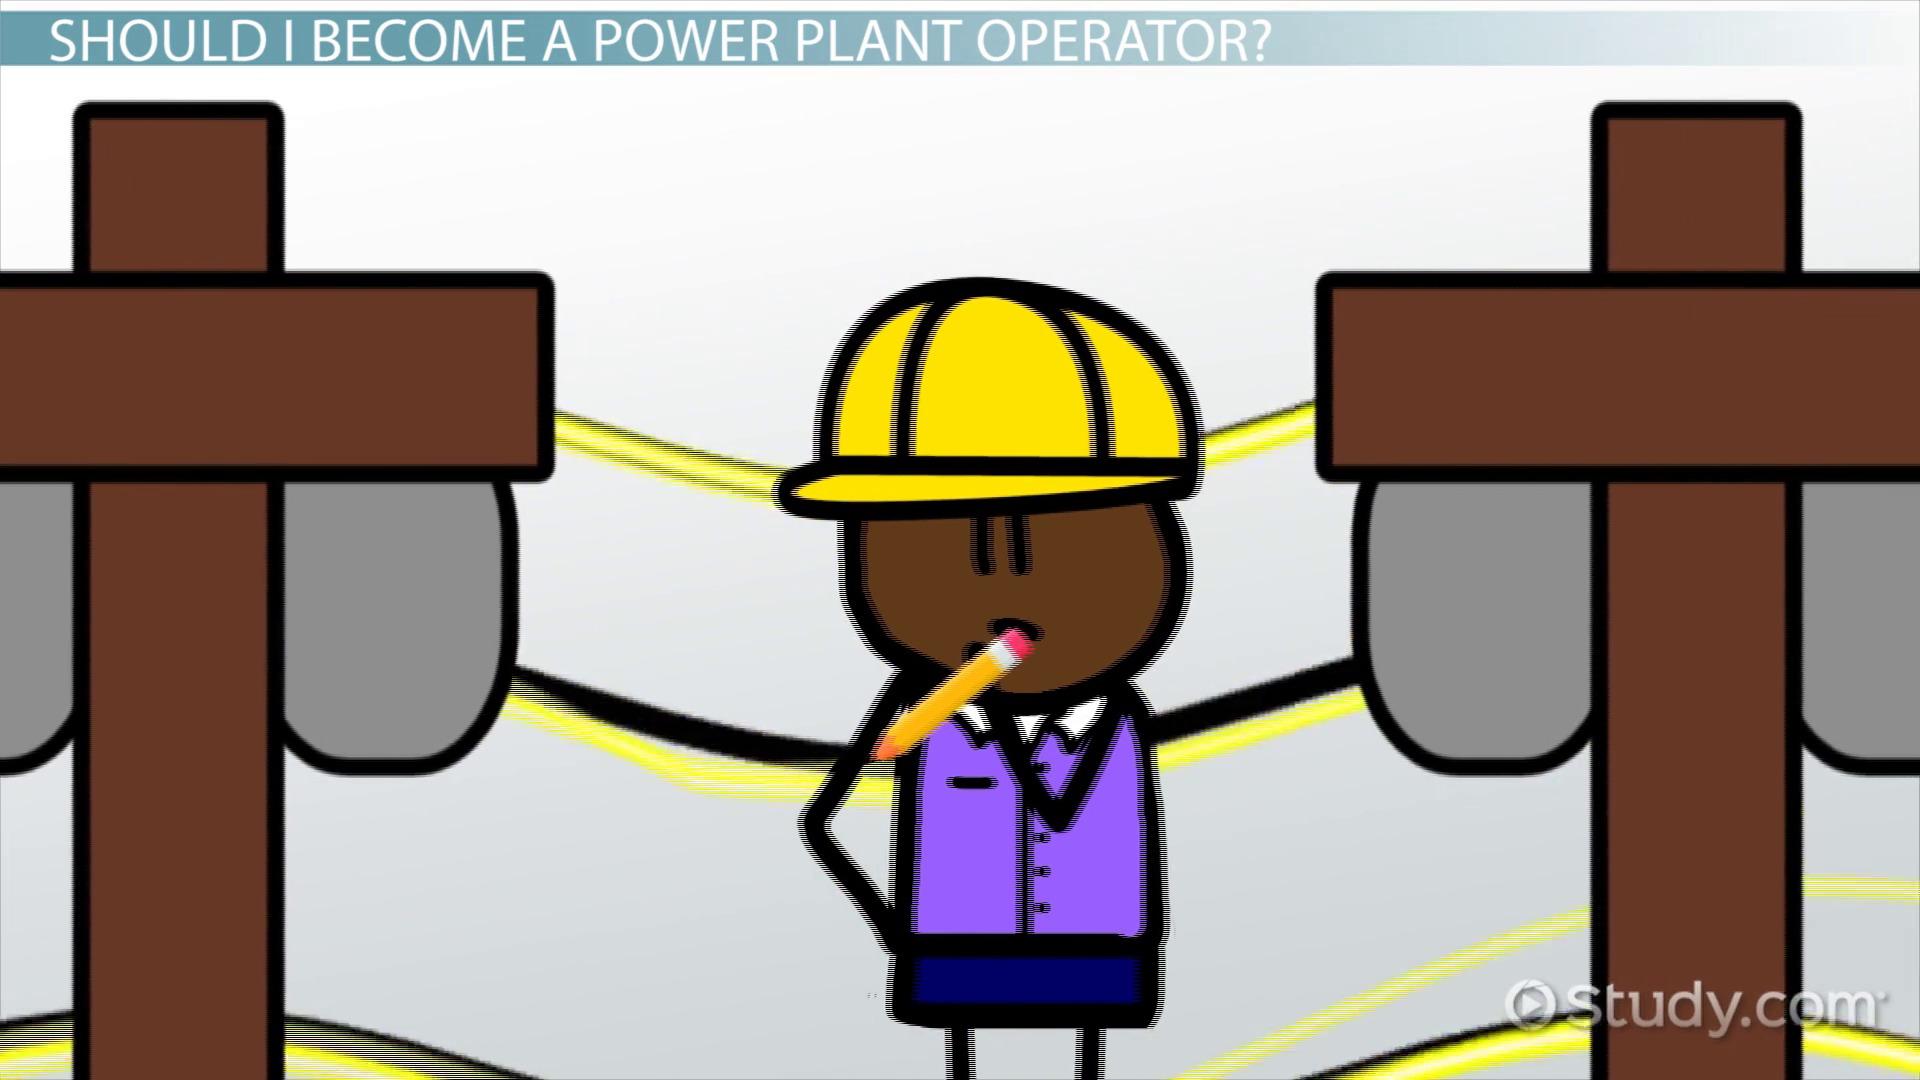 nuclear power plant engineer sample resume nuclear power plant engineer sample resume - Power Plant Engineer Sample Resume